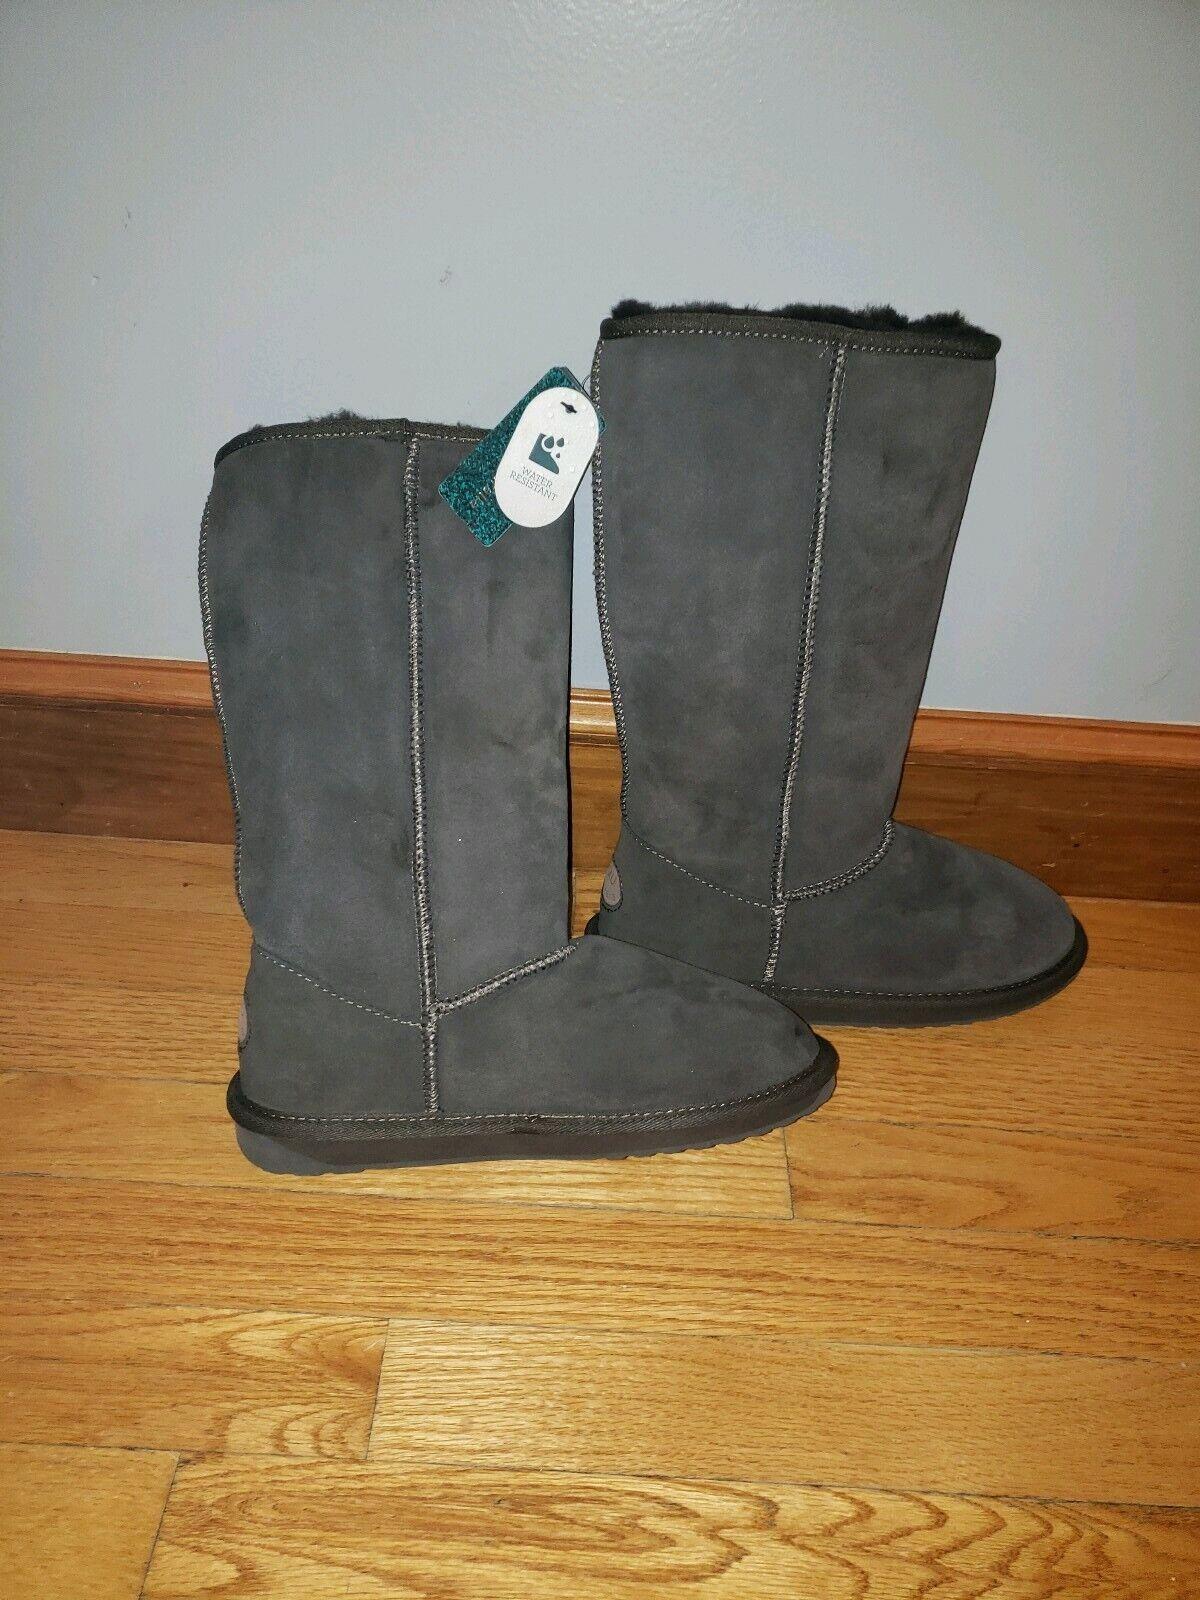 Emu Australia Winter Boots Mushroom Suede Sheepskin Sheepskin Sheepskin Stinger -Hi Women's 7 5dc901